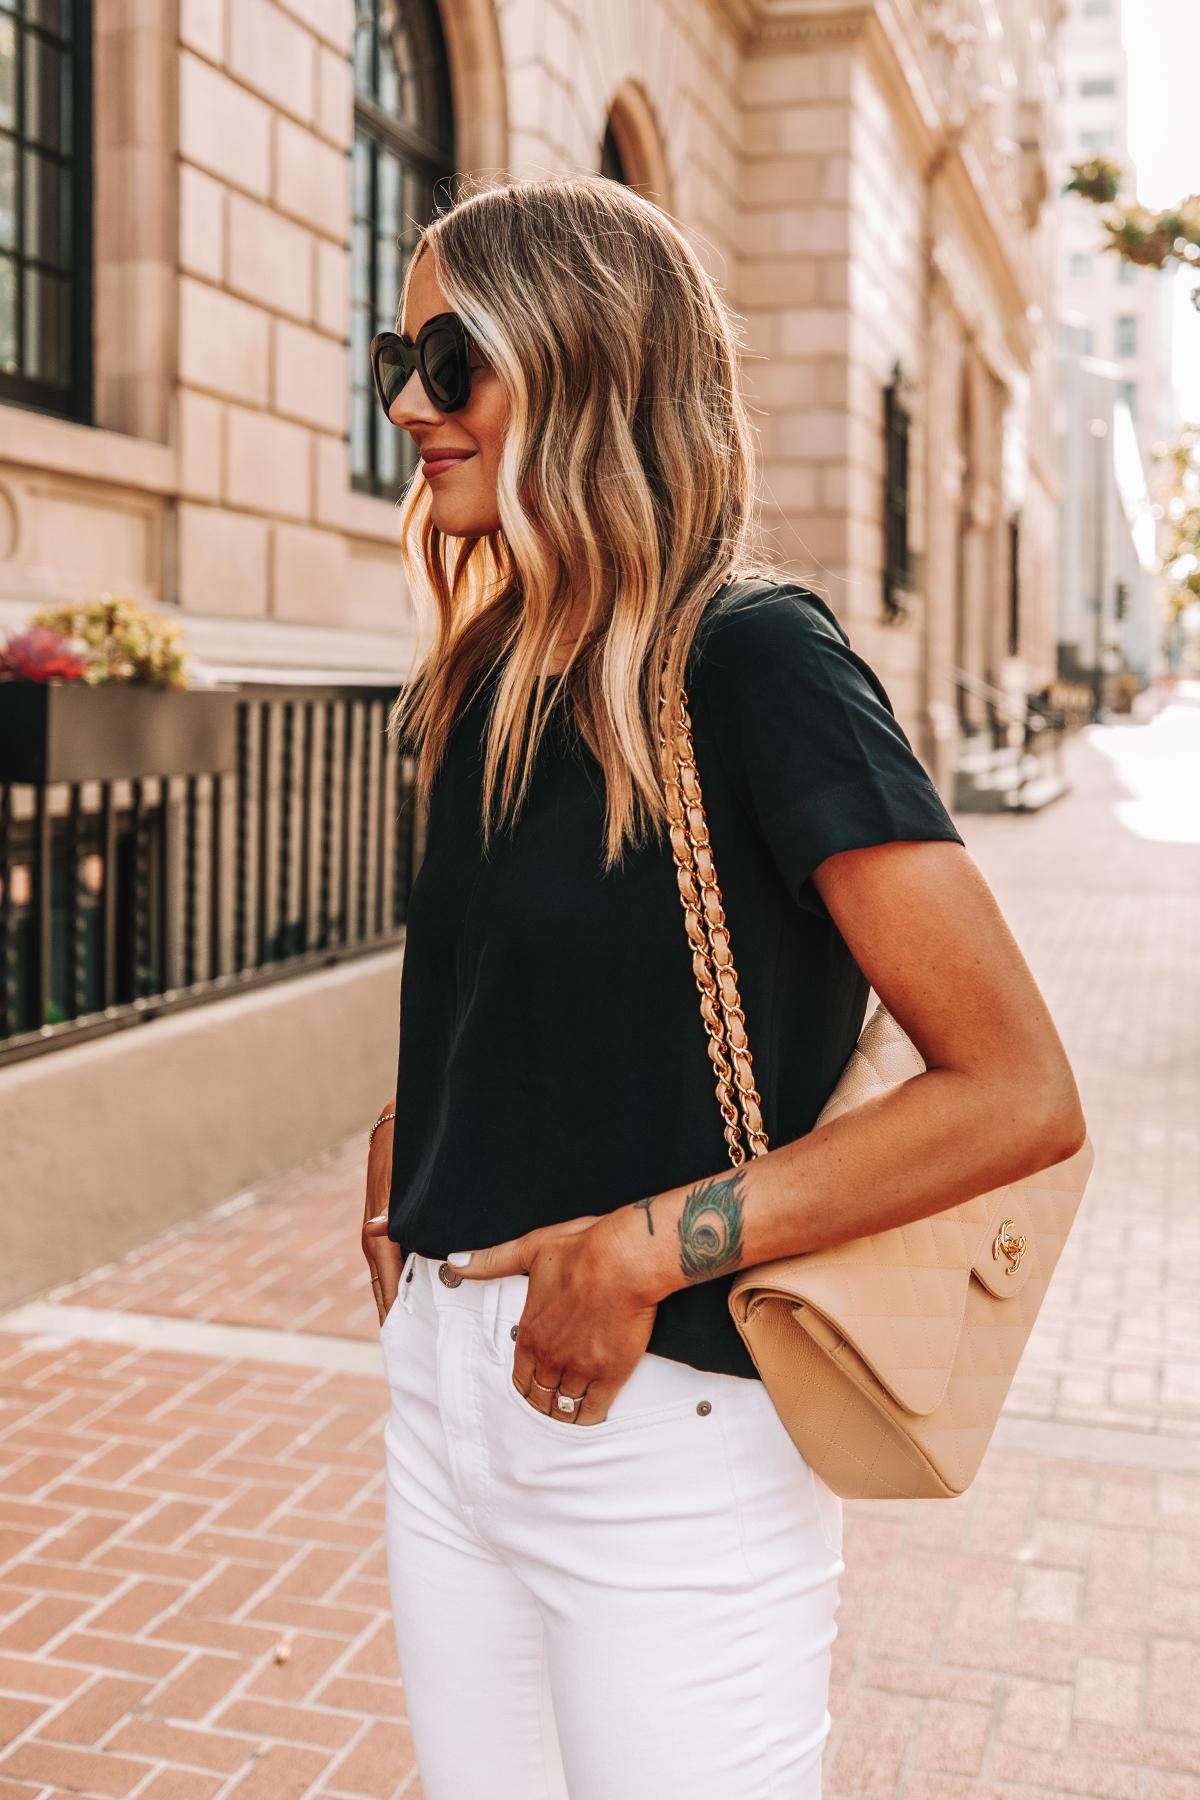 Fashion Jackson Wearing Everlane Black Short Sleeve Top High Rise White Skinny Jeans Chanel Beige Handbag